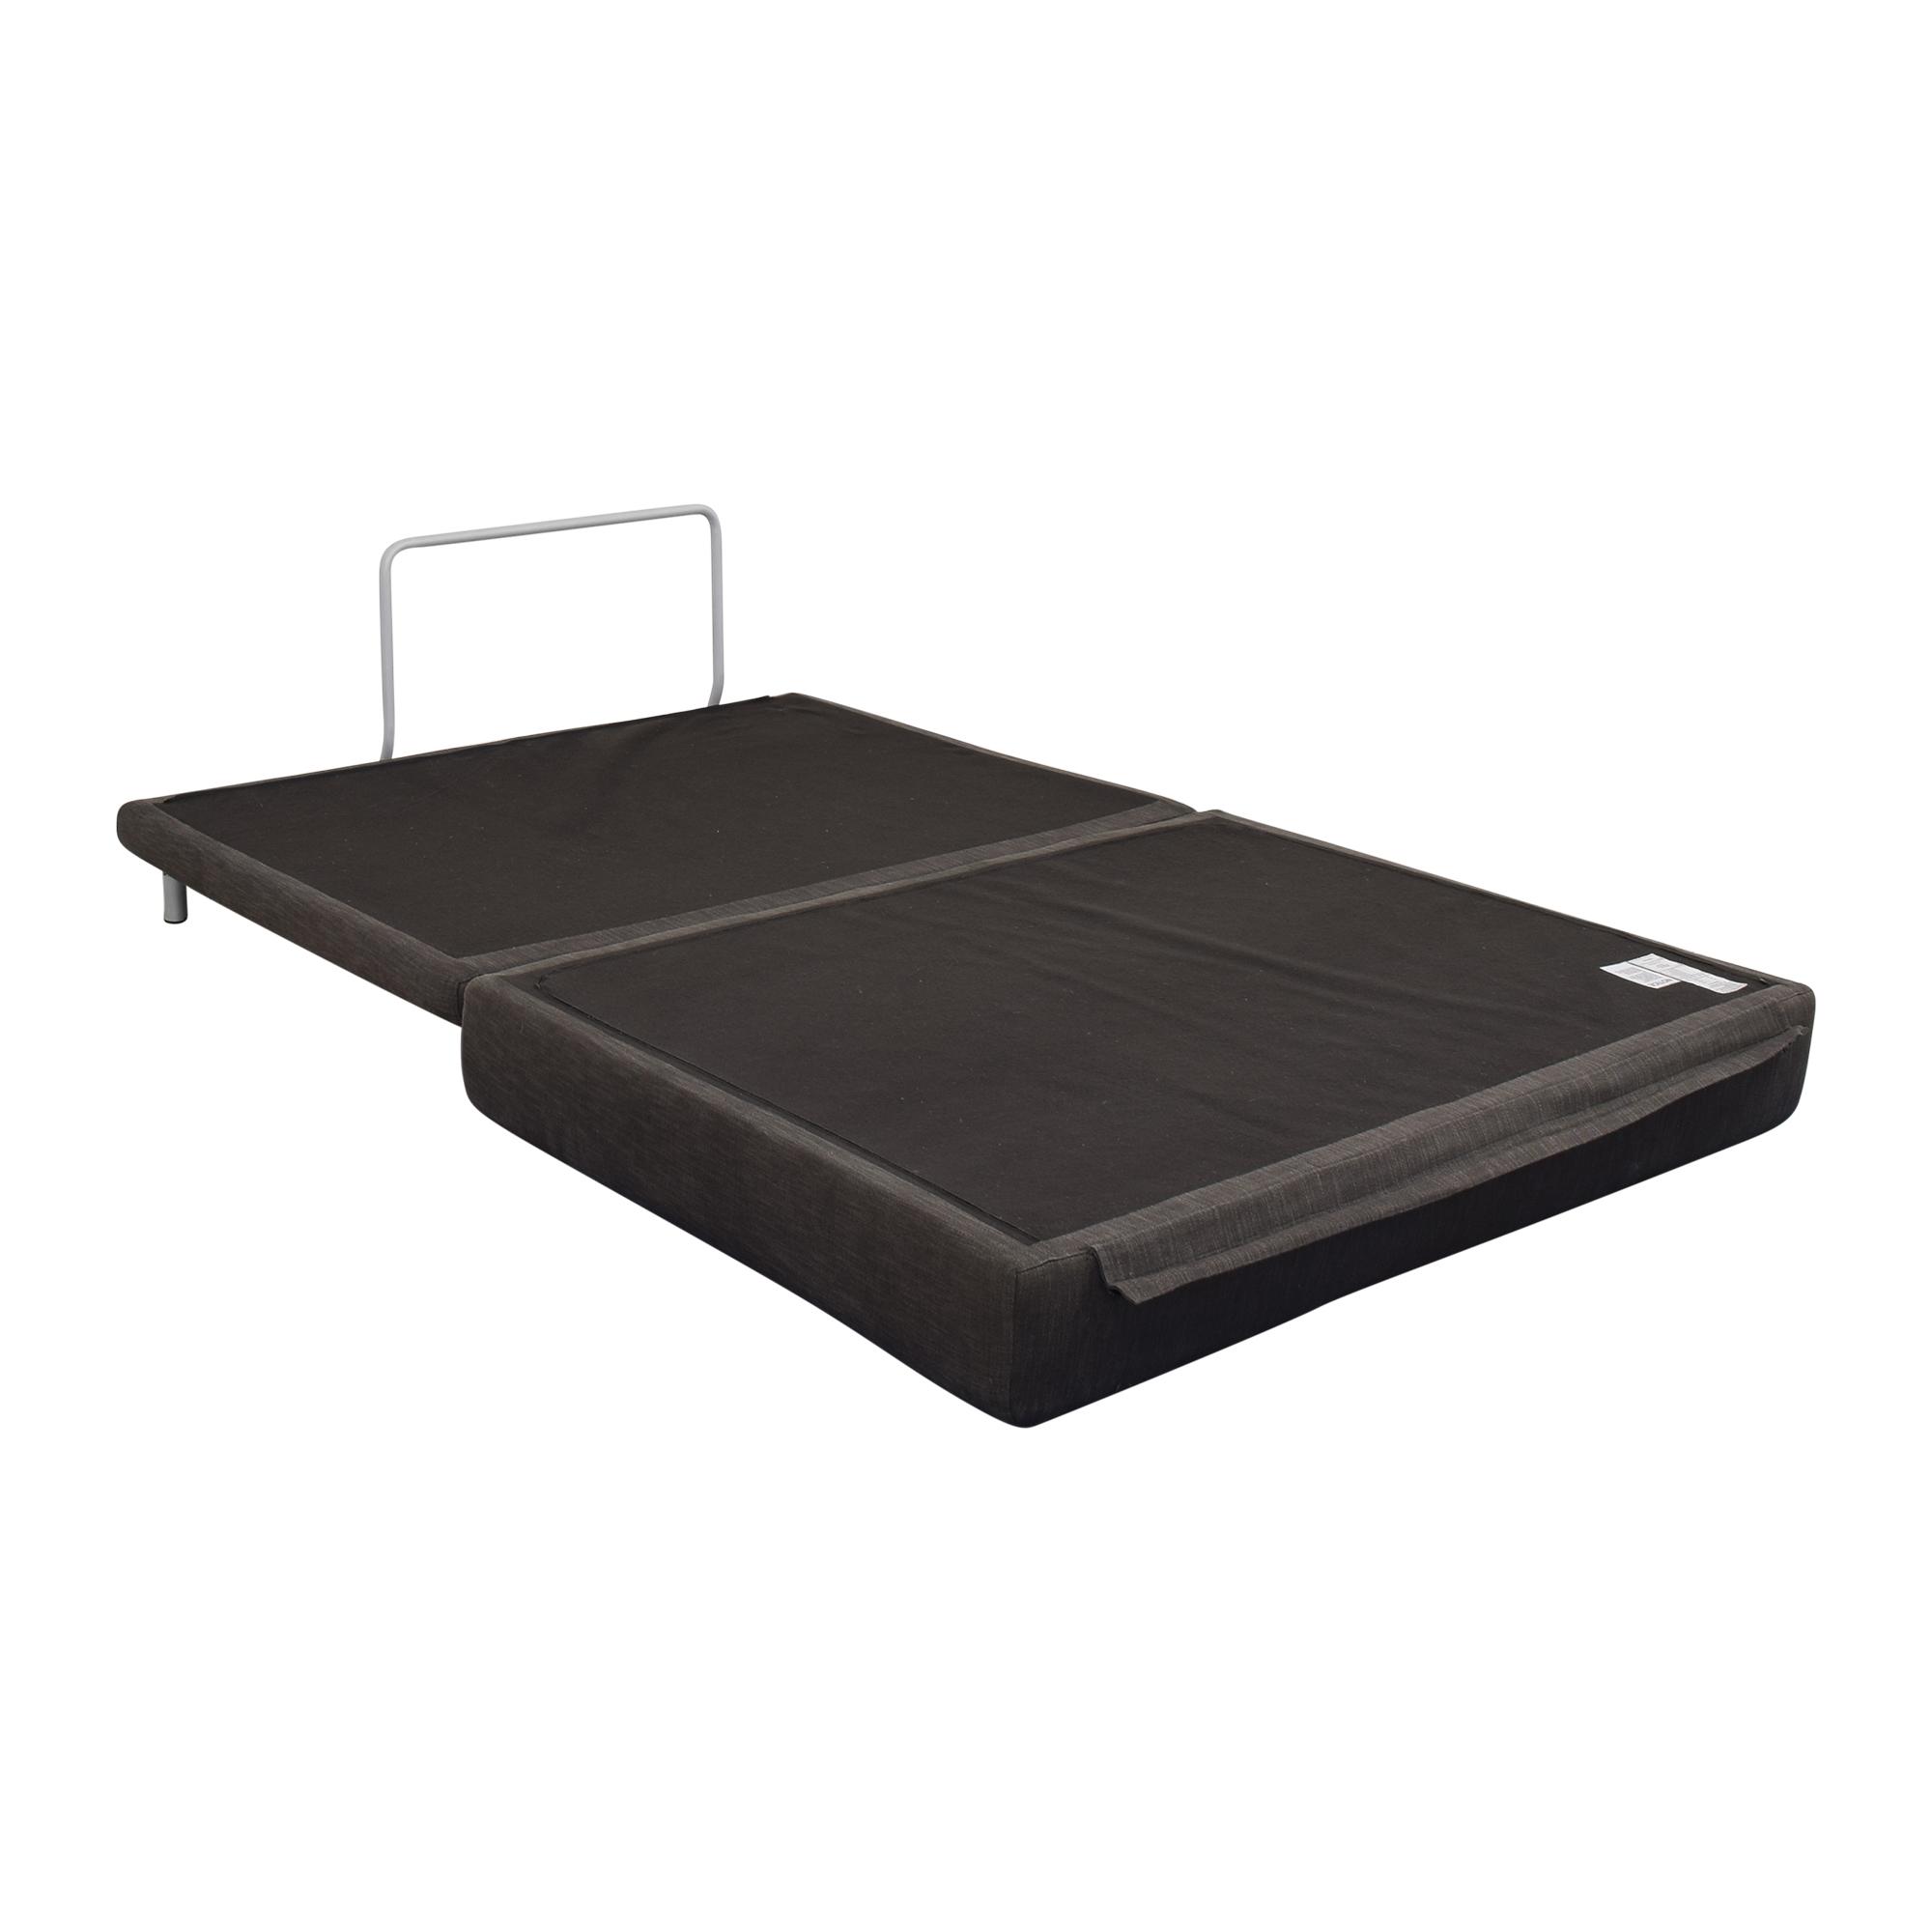 Softline Softline Queen Sofa Bed used